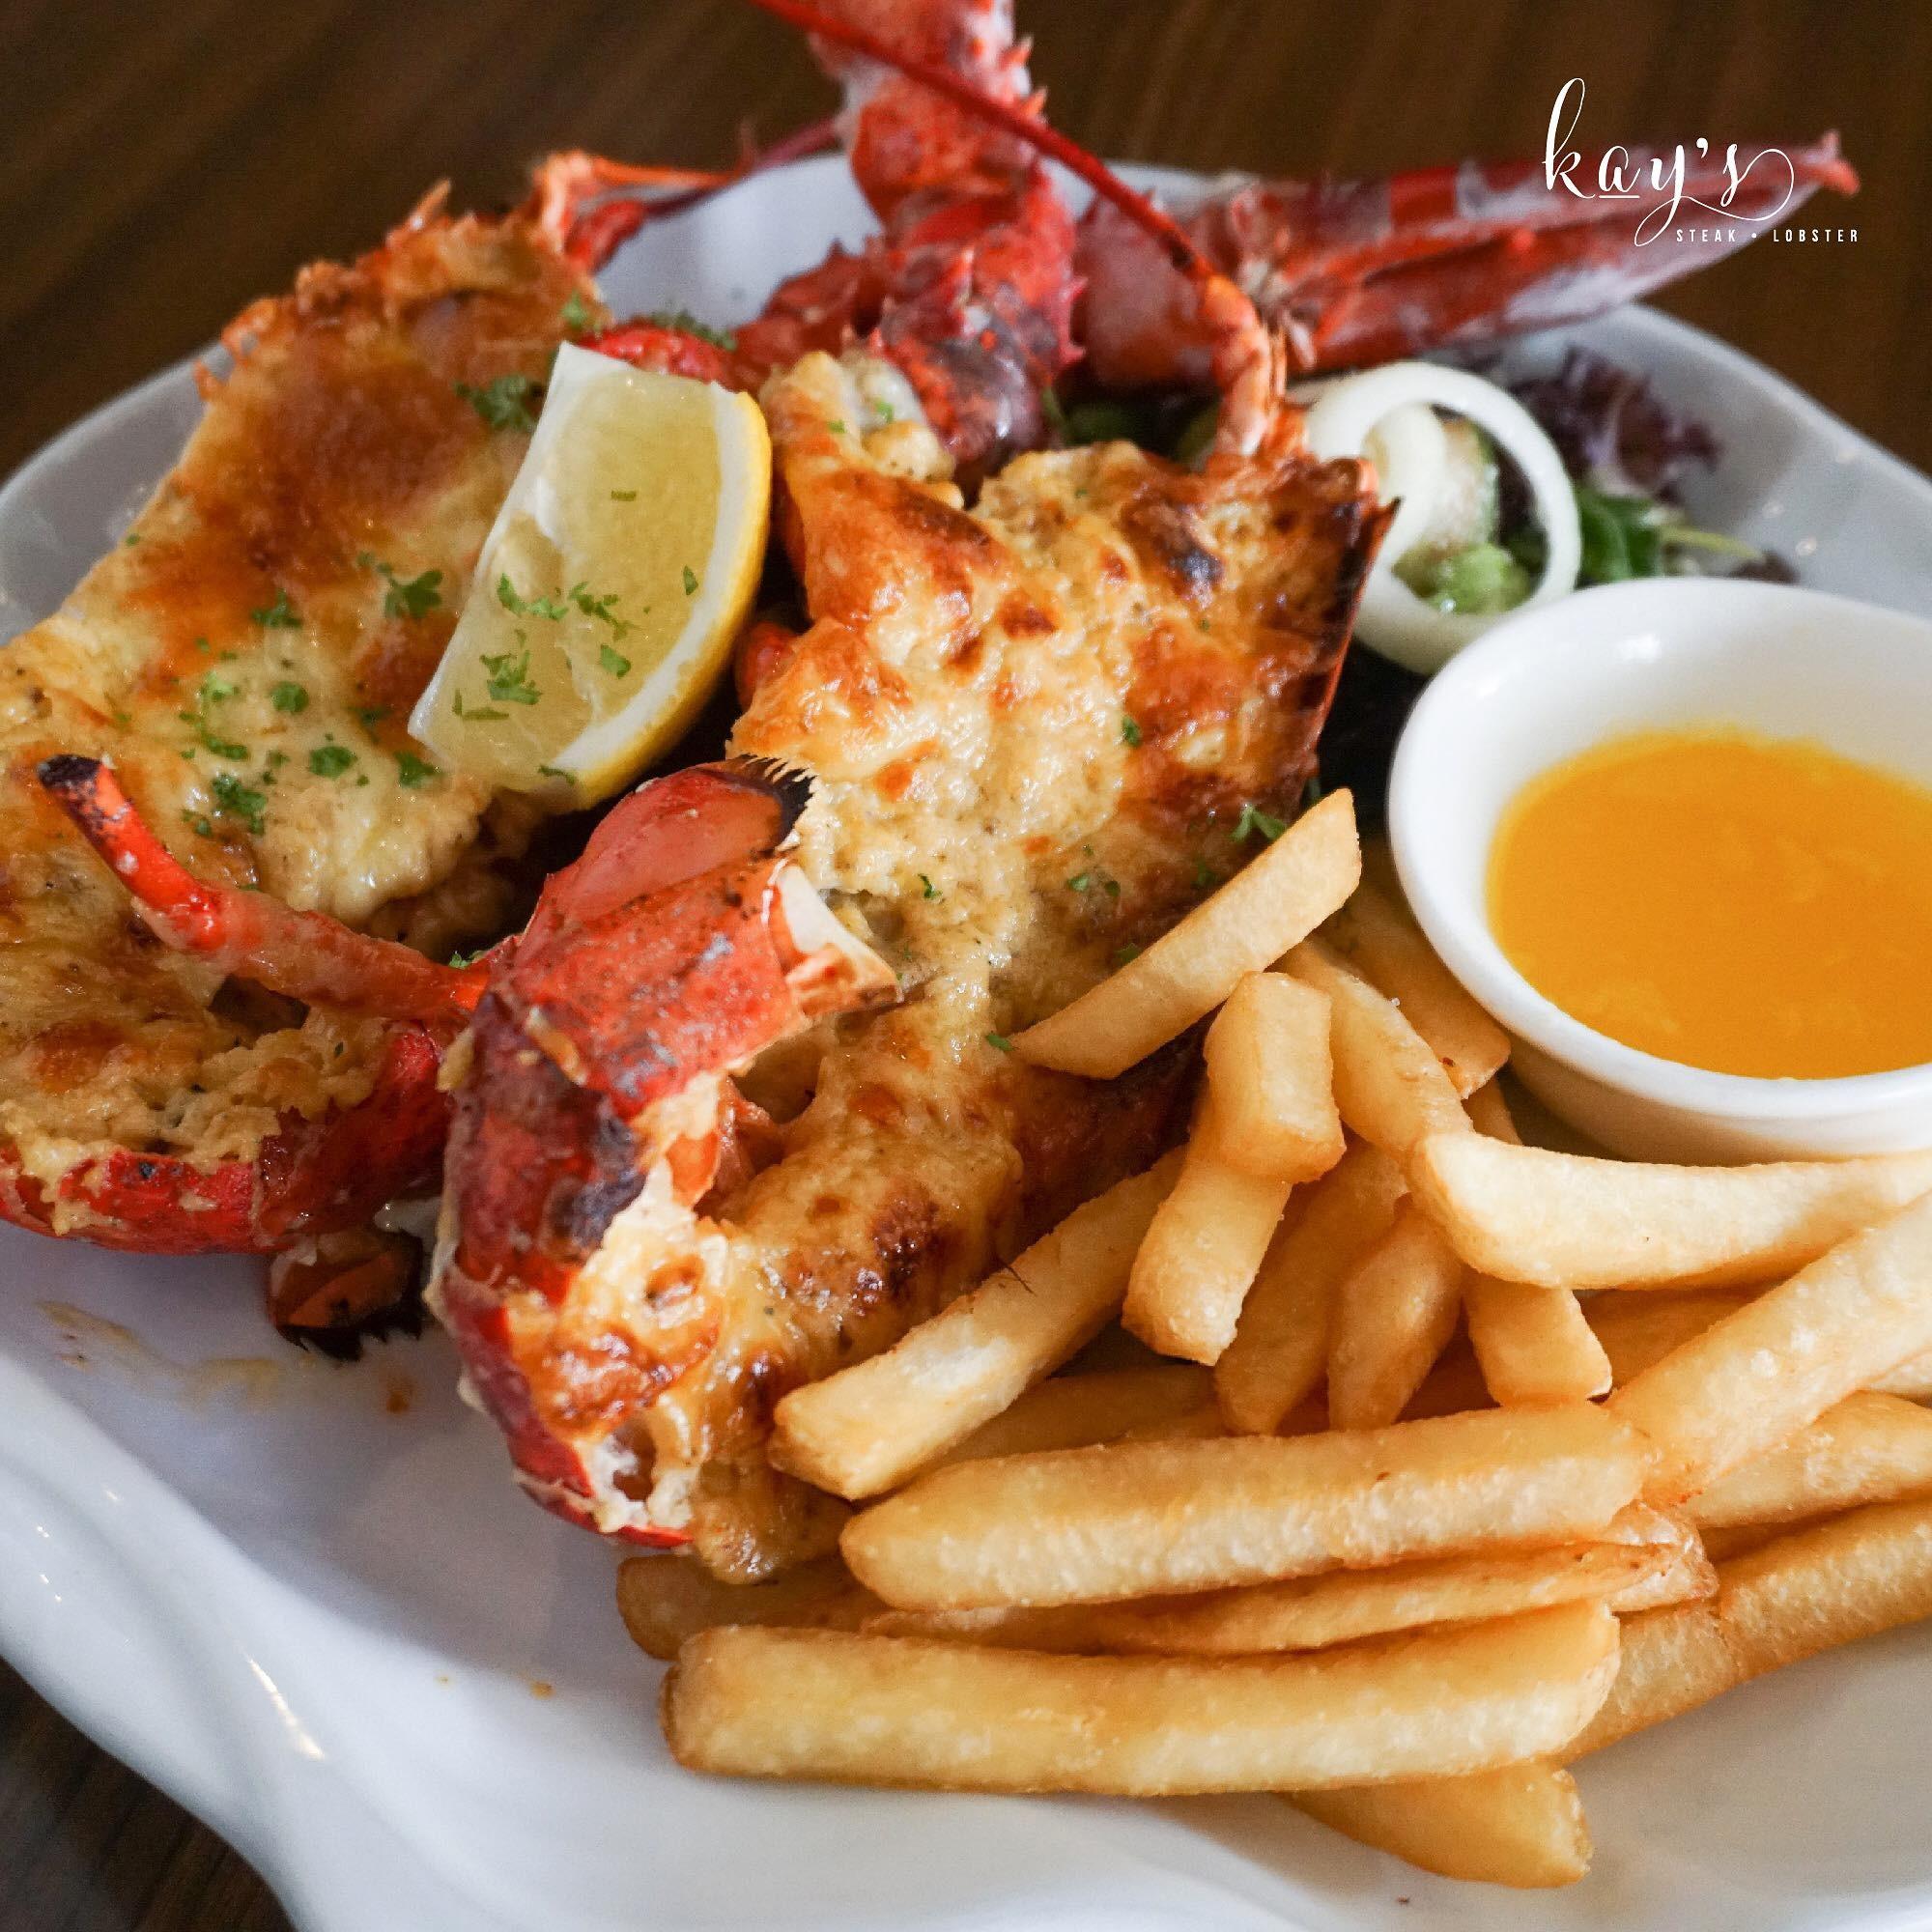 Kay's Steak and Lobster Halal food KL Malaysia Kuala Lumpur